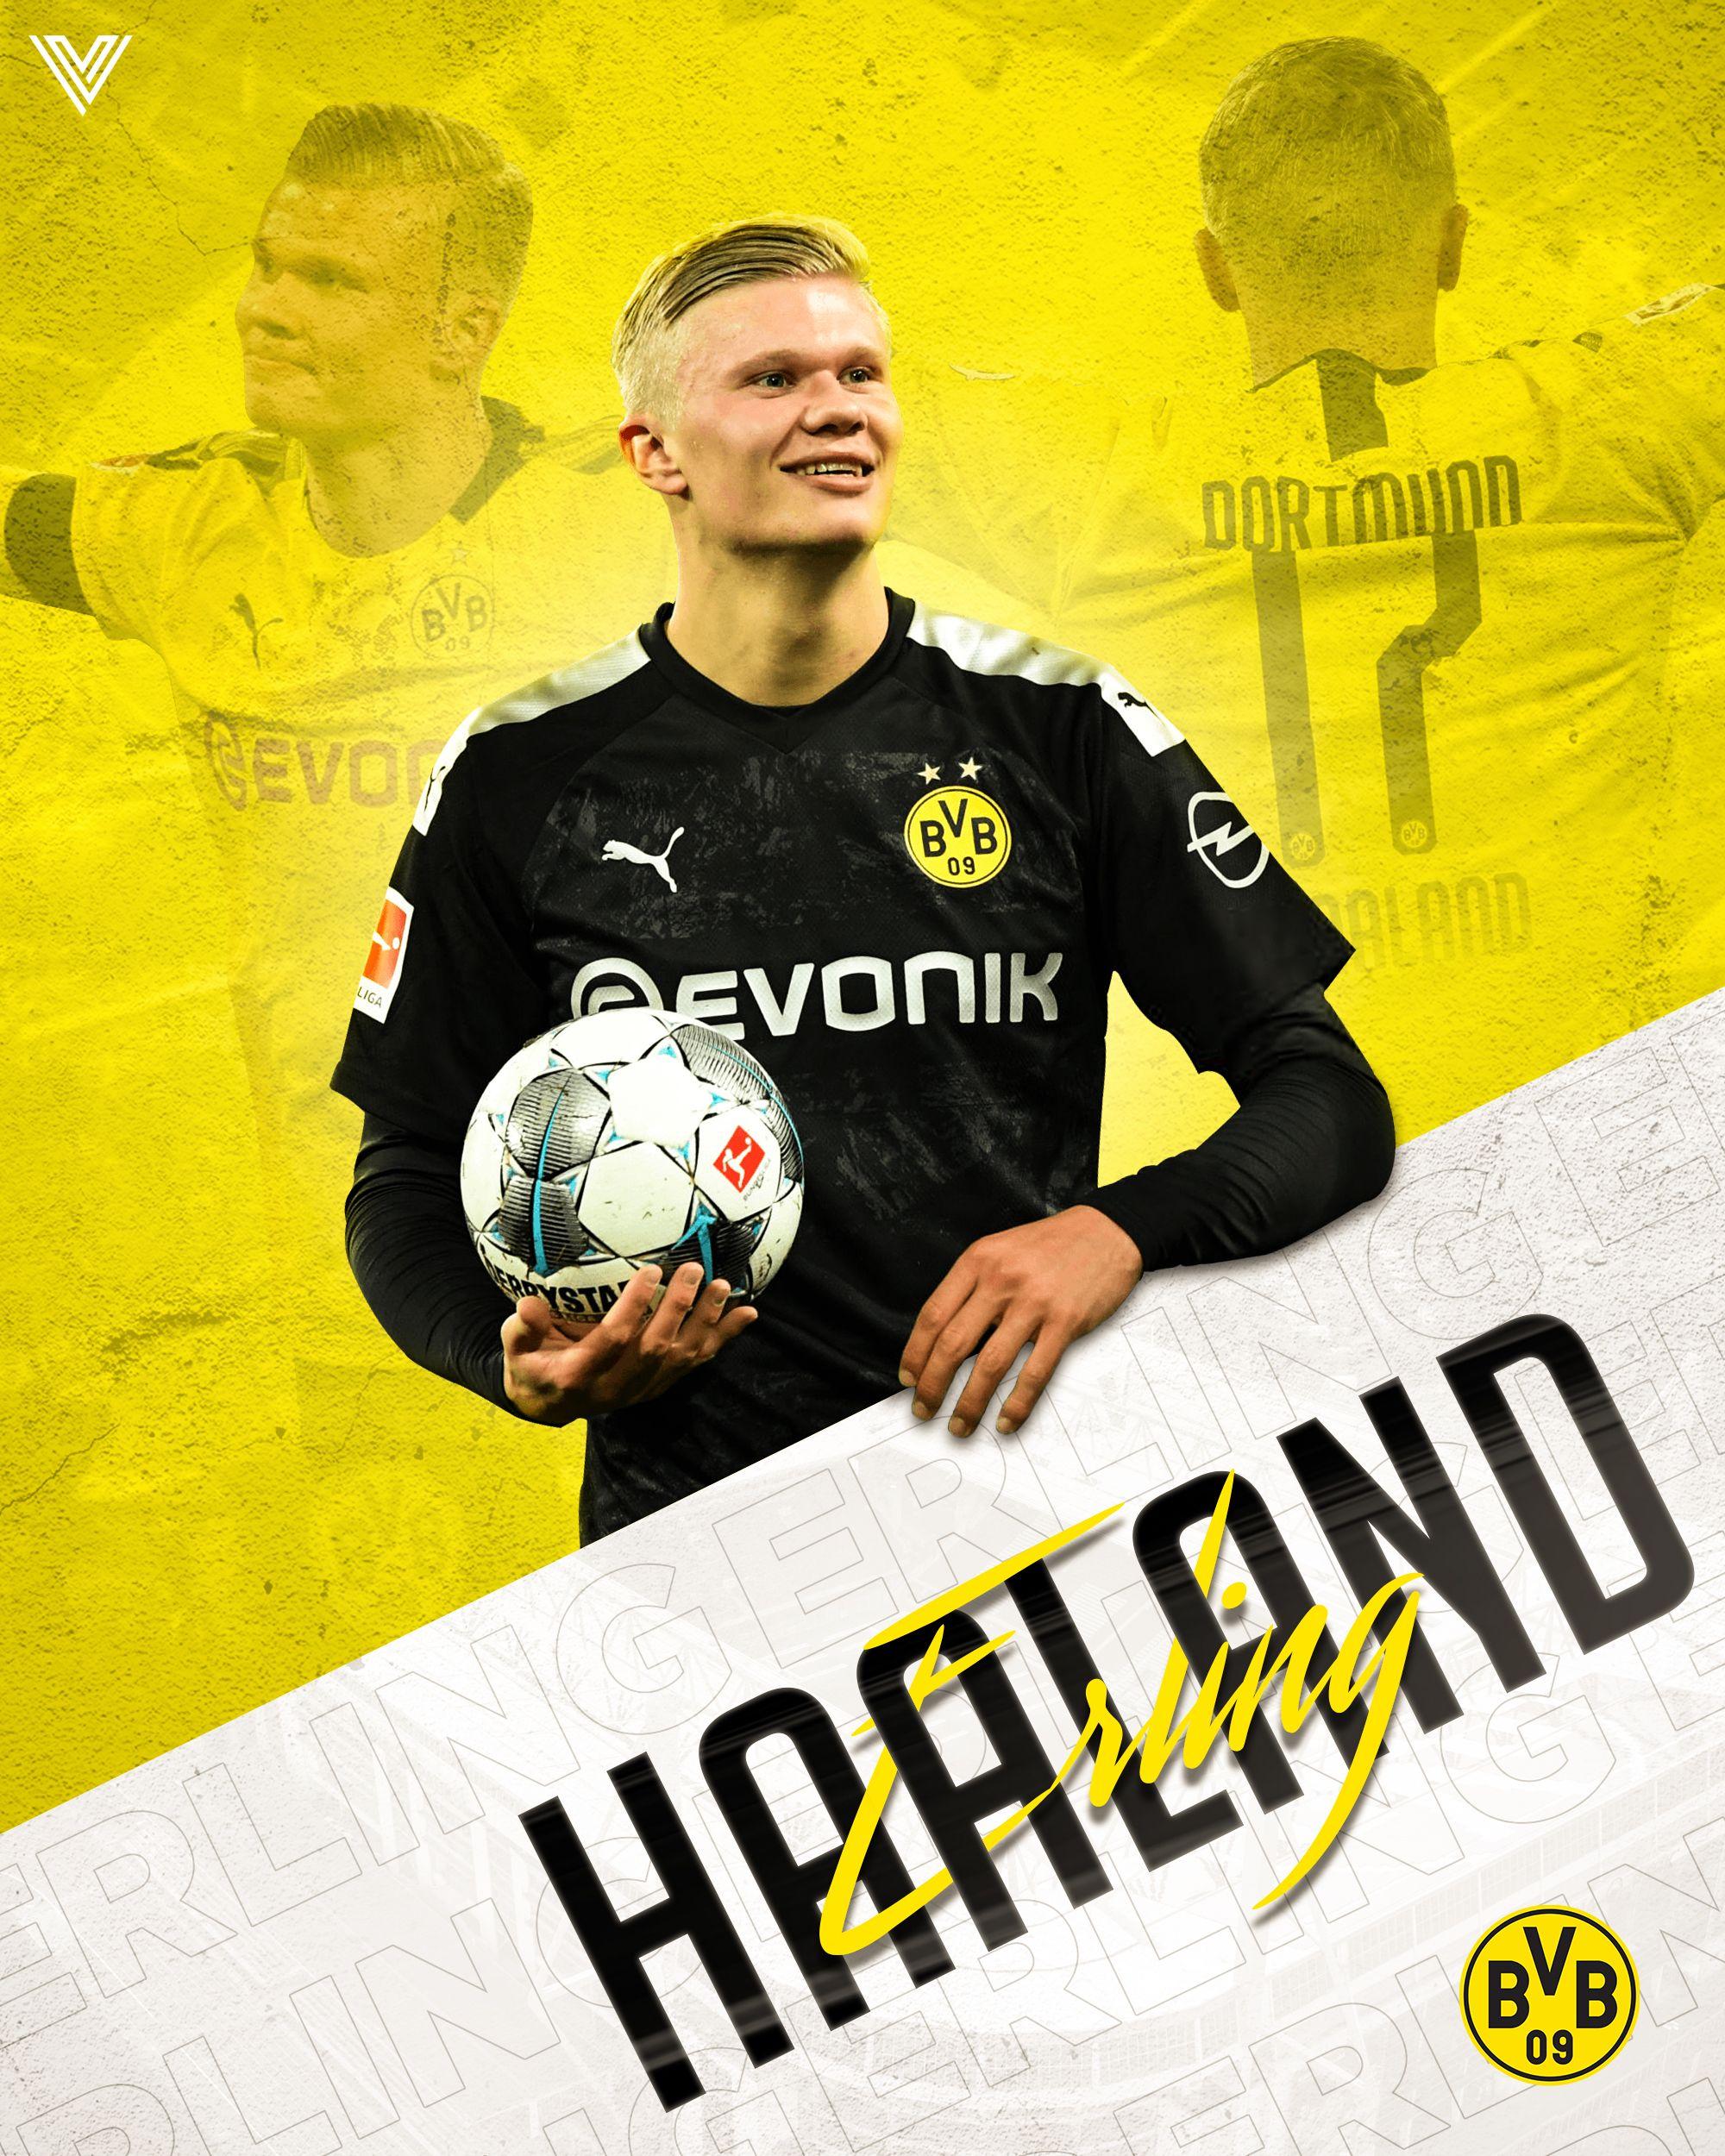 Erling Haaland Poster Design Vathana Meng In 2020 Football Poster Soccer Memes Sport Poster